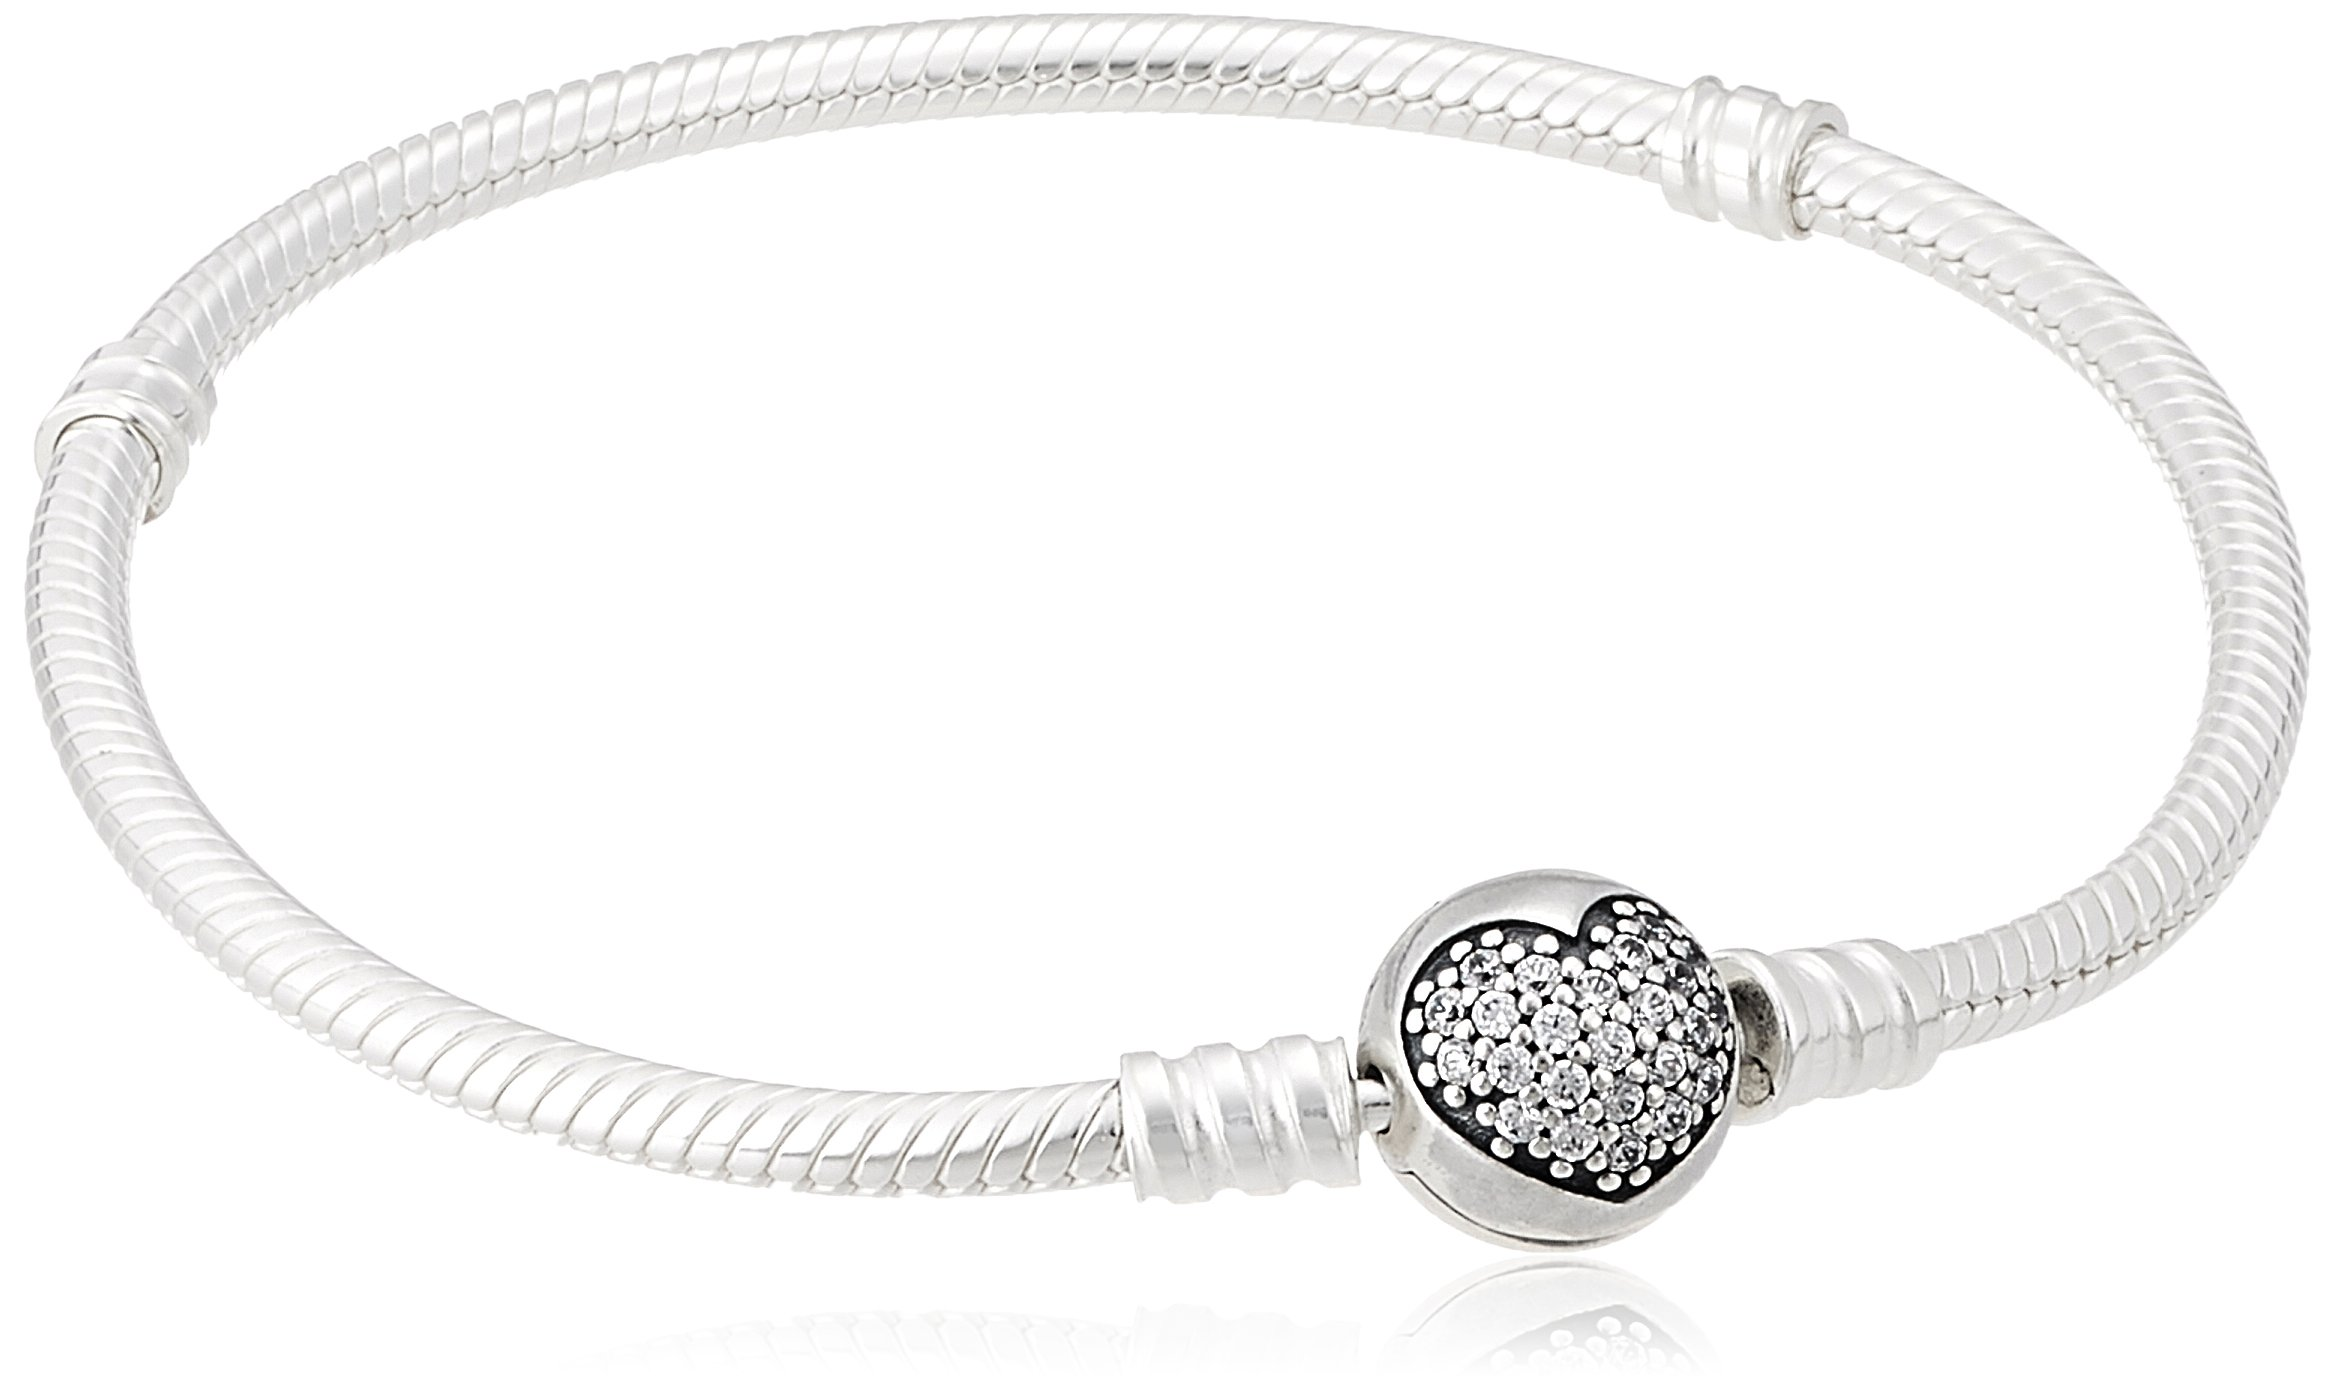 PANDORA-Sparkling-Heart-Bracelet-Clear-CZ-590743CZ-21-83-in